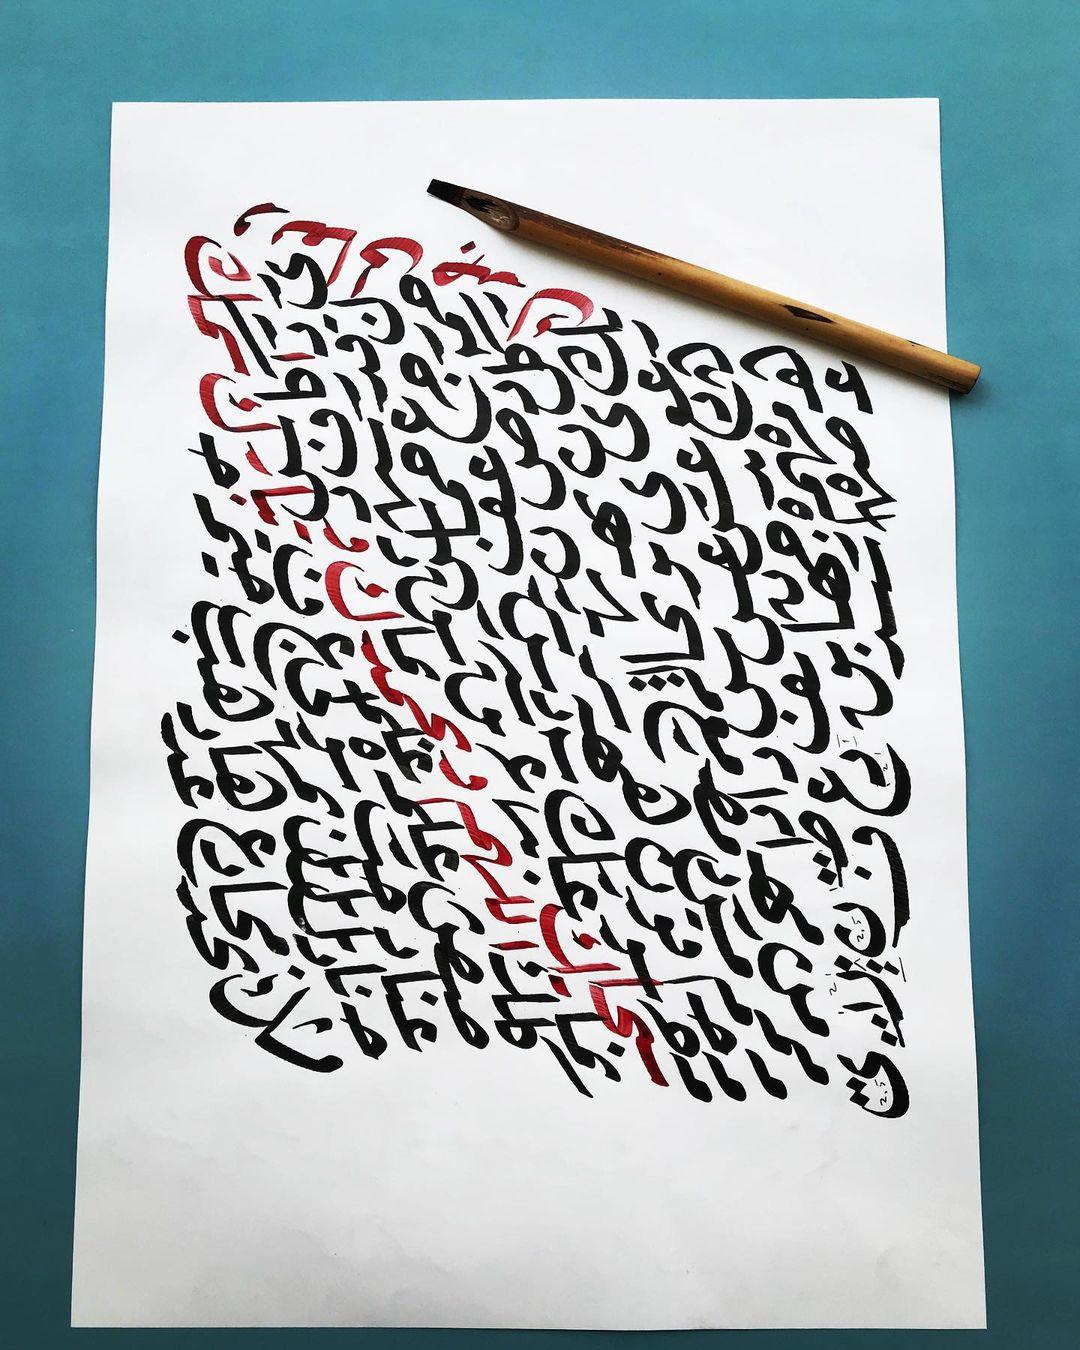 Donwload Photo Mashq #mashq #مشق #exercise #arabiccalligraphy #islamiccalligraphy #tezhip #hüs...- hattat_aa 1